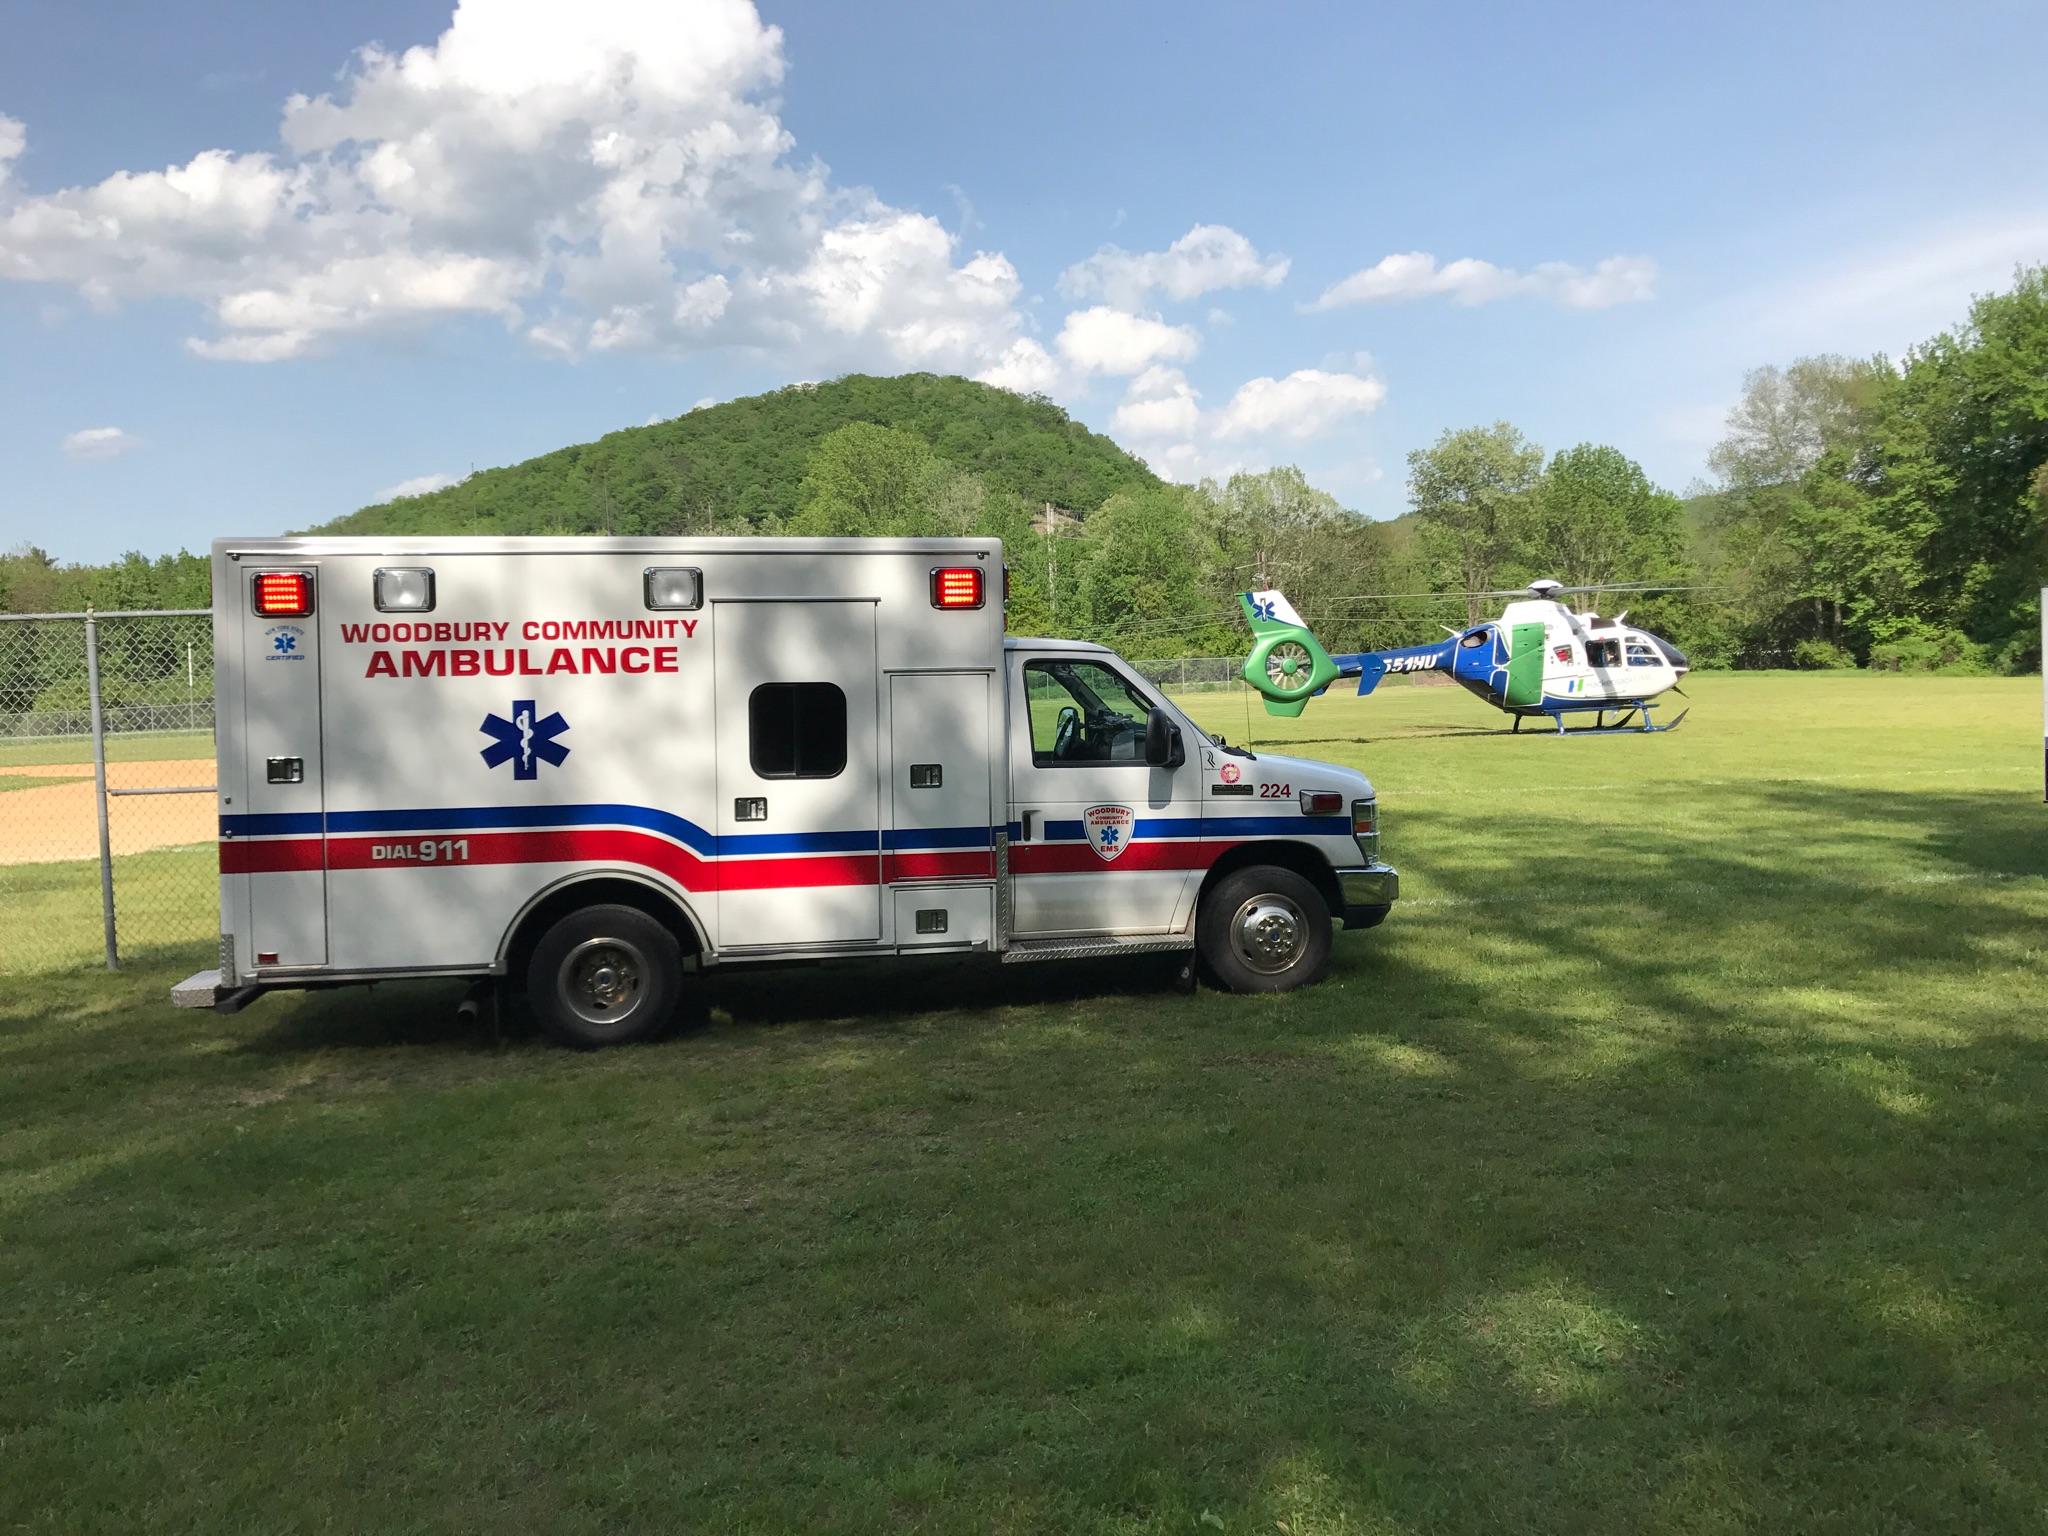 Woodbury EMS